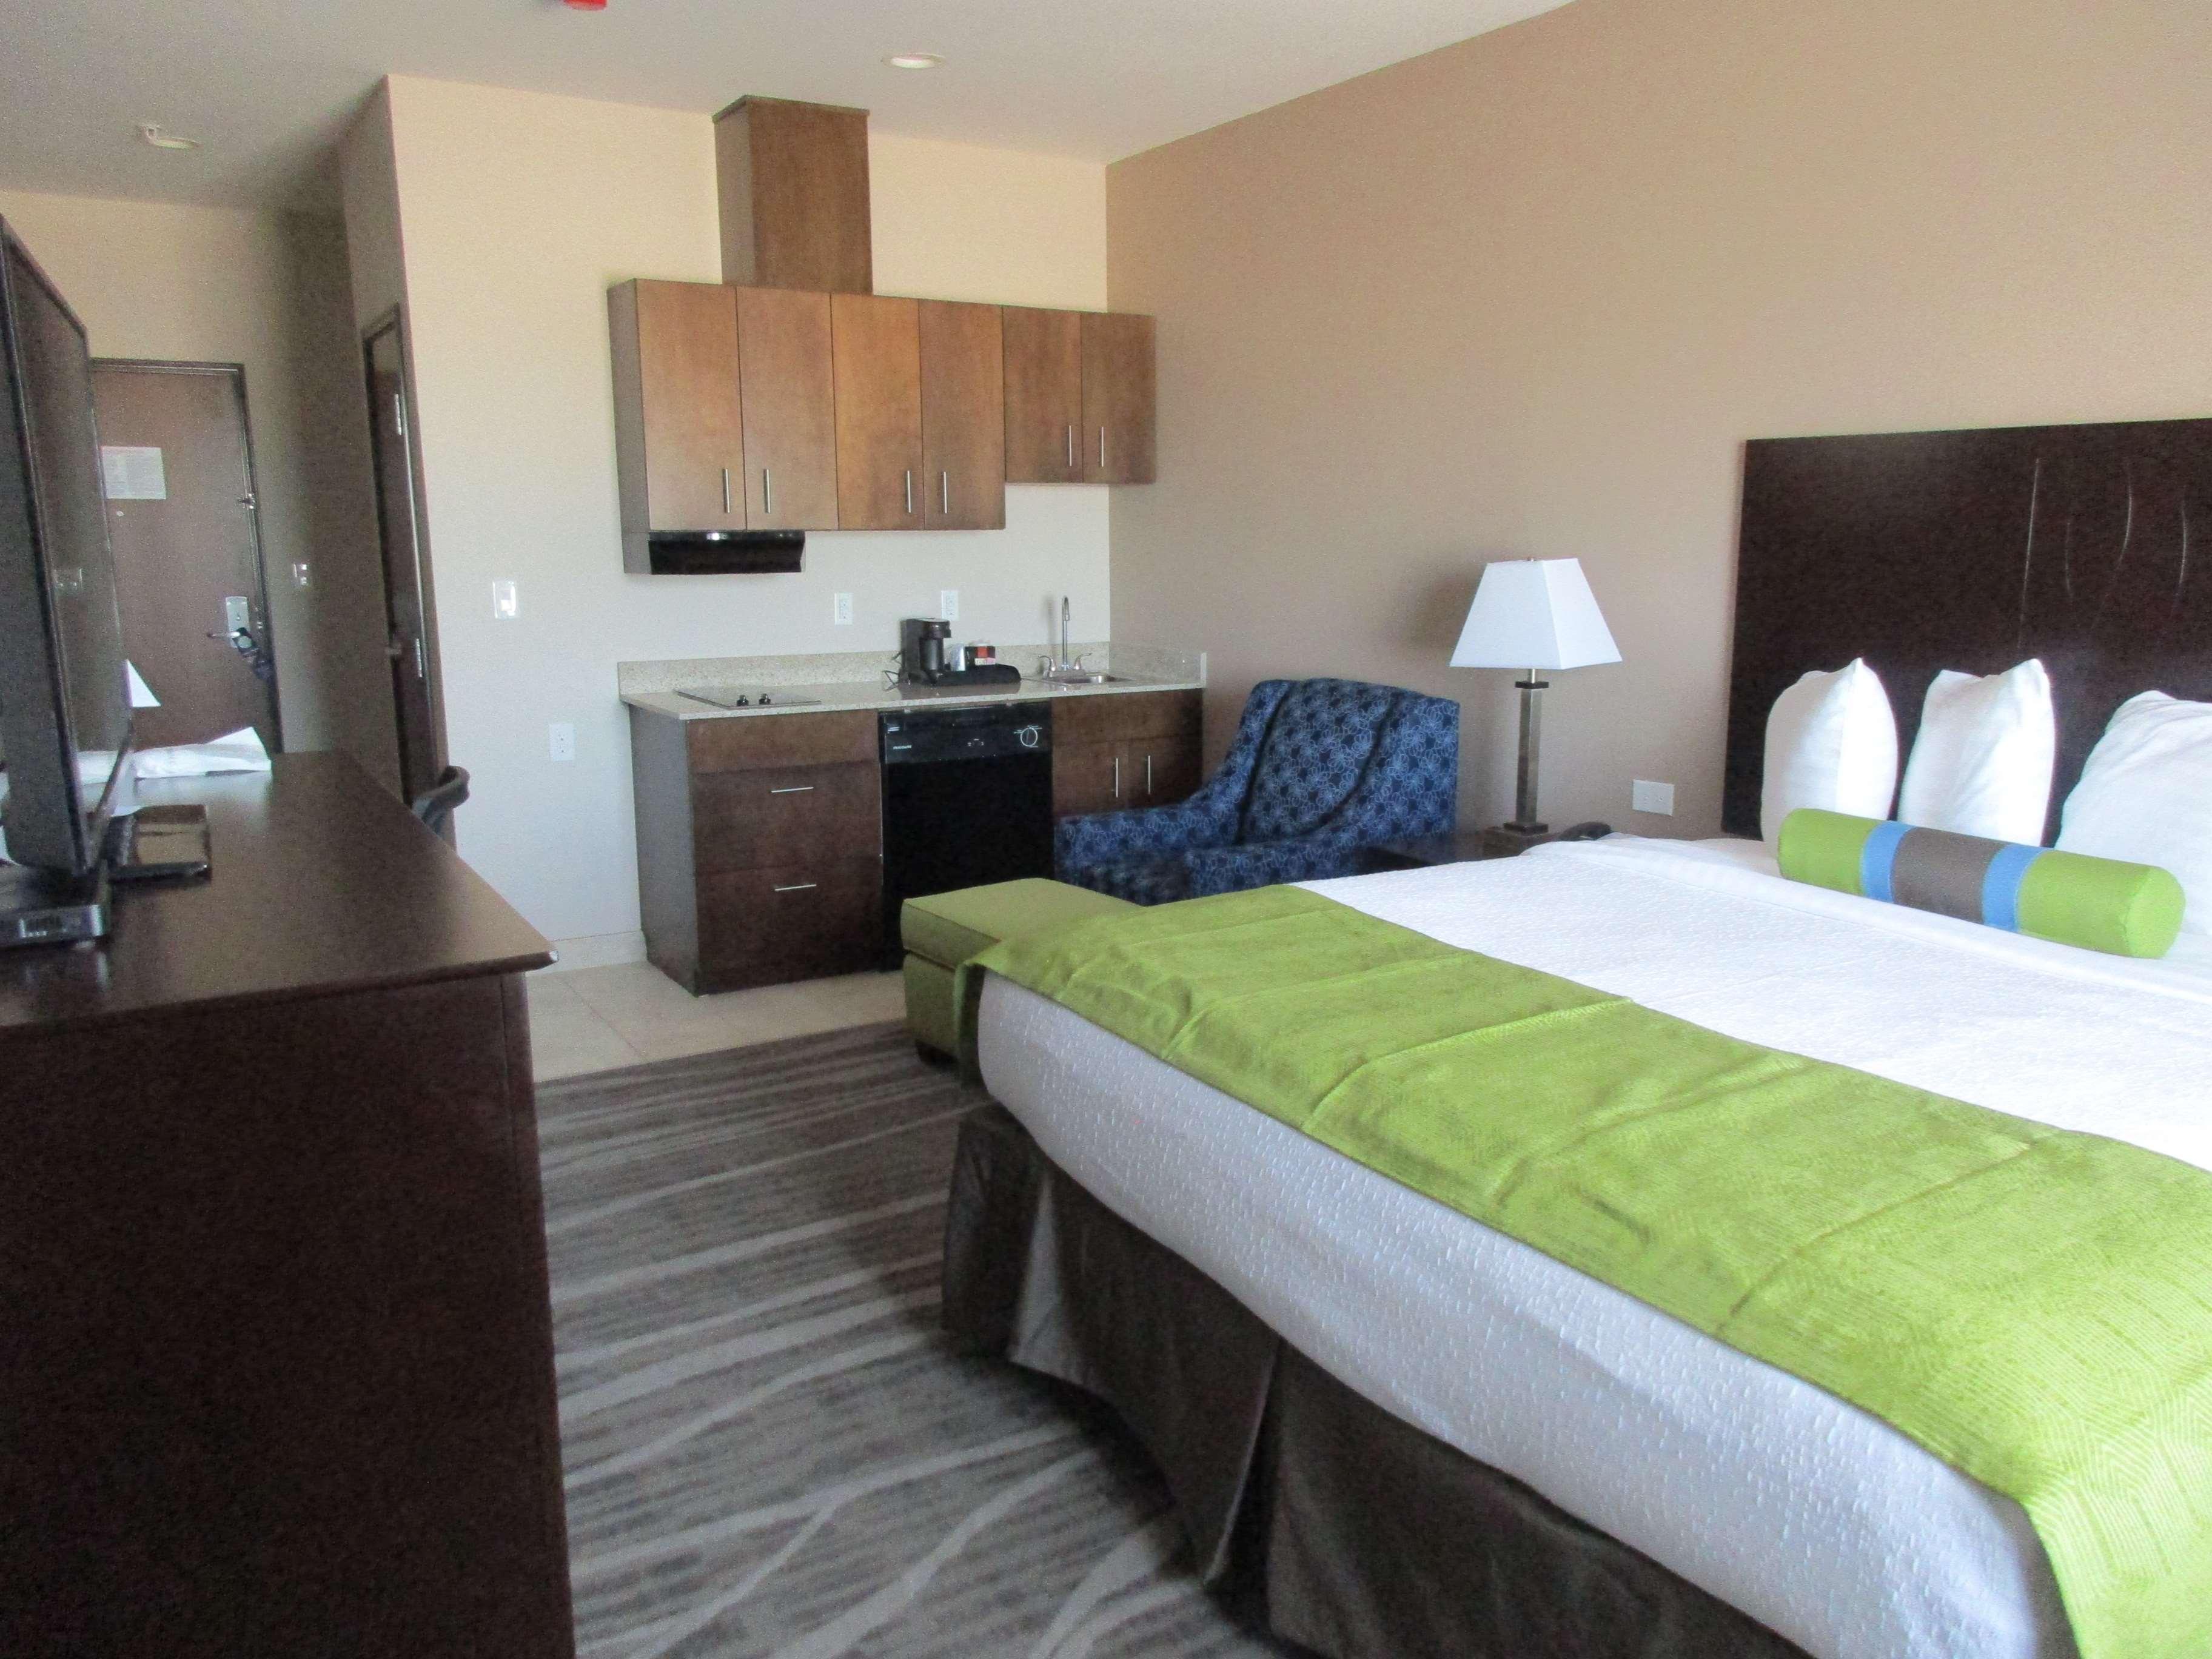 Best Western Plus Denver City Hotel & Suites image 10